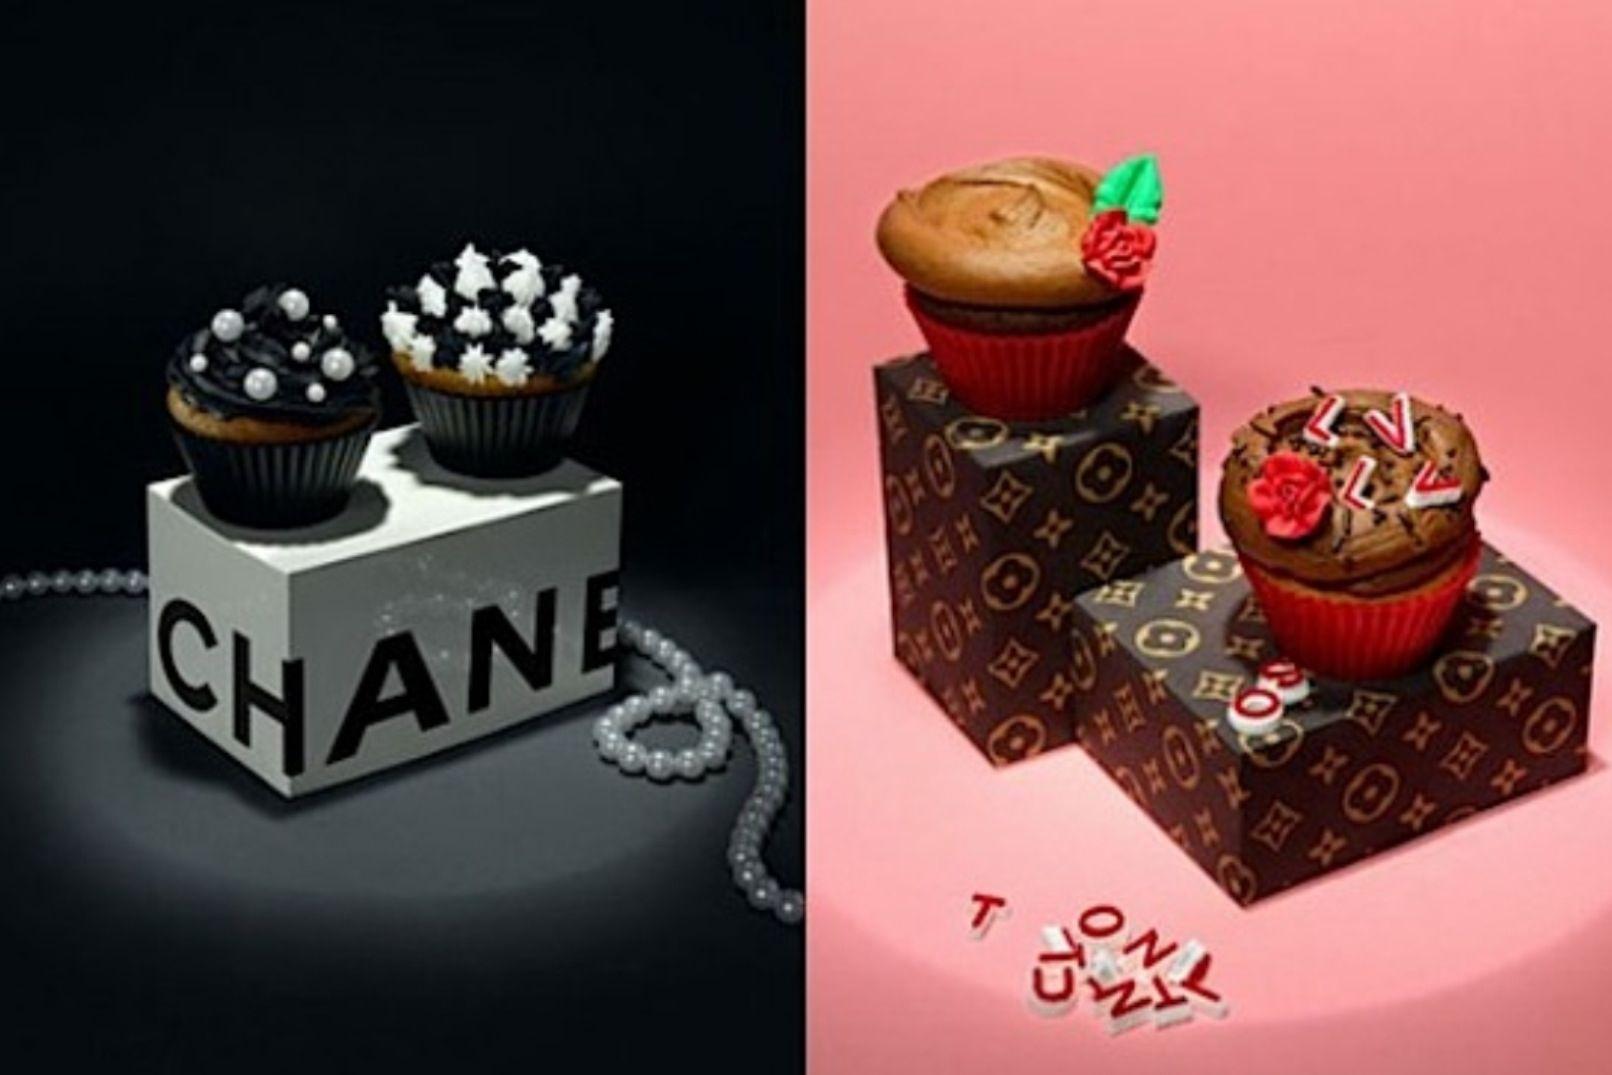 Cupcakes love LV & Chanel